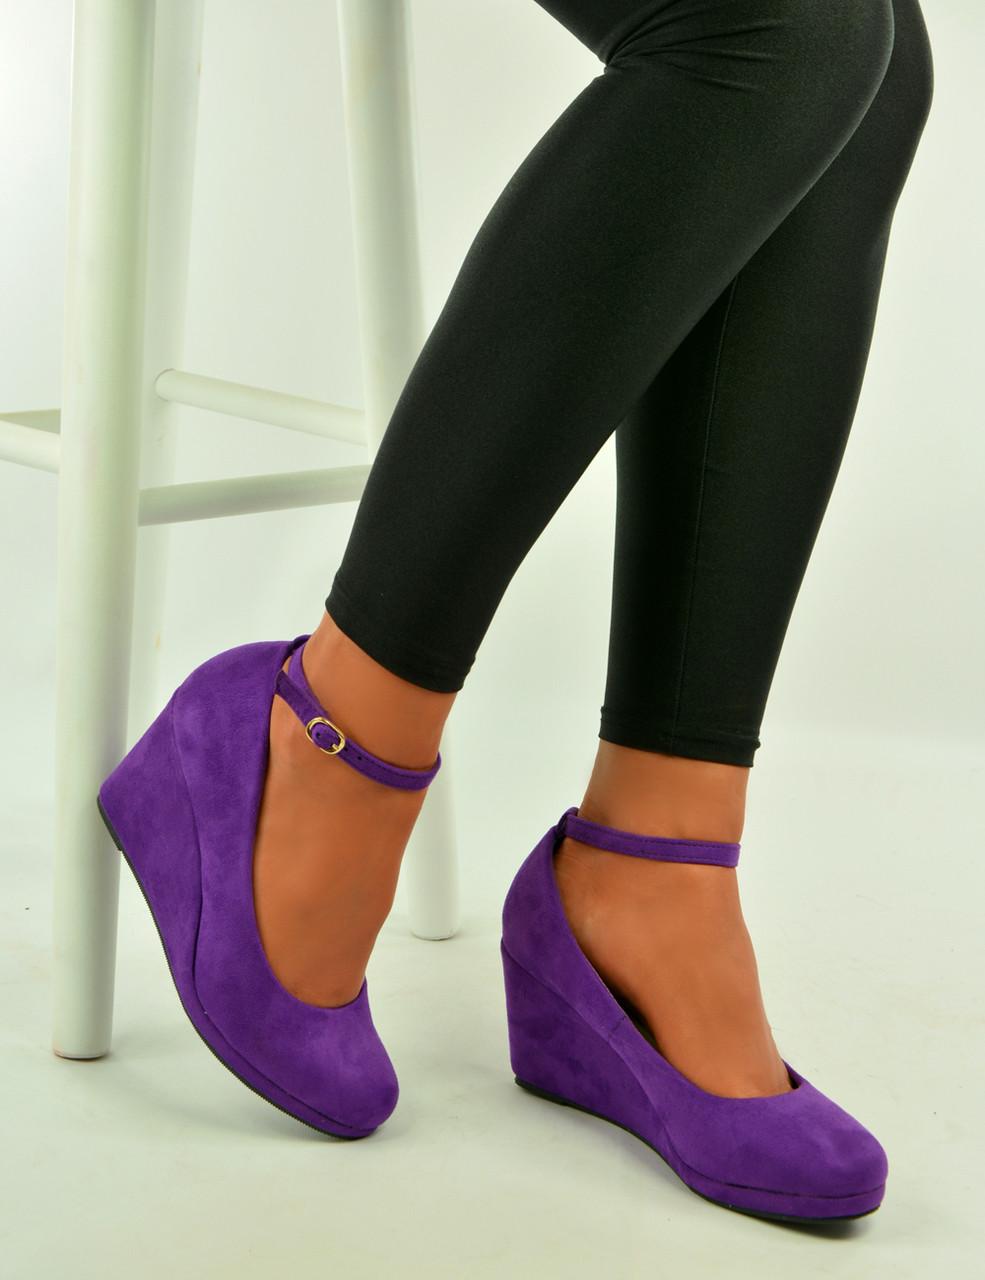 67c766ec0bd New womens ladies purple suede platform pumps wedges sandals shoes jpg  985x1280 Purple pink wedges